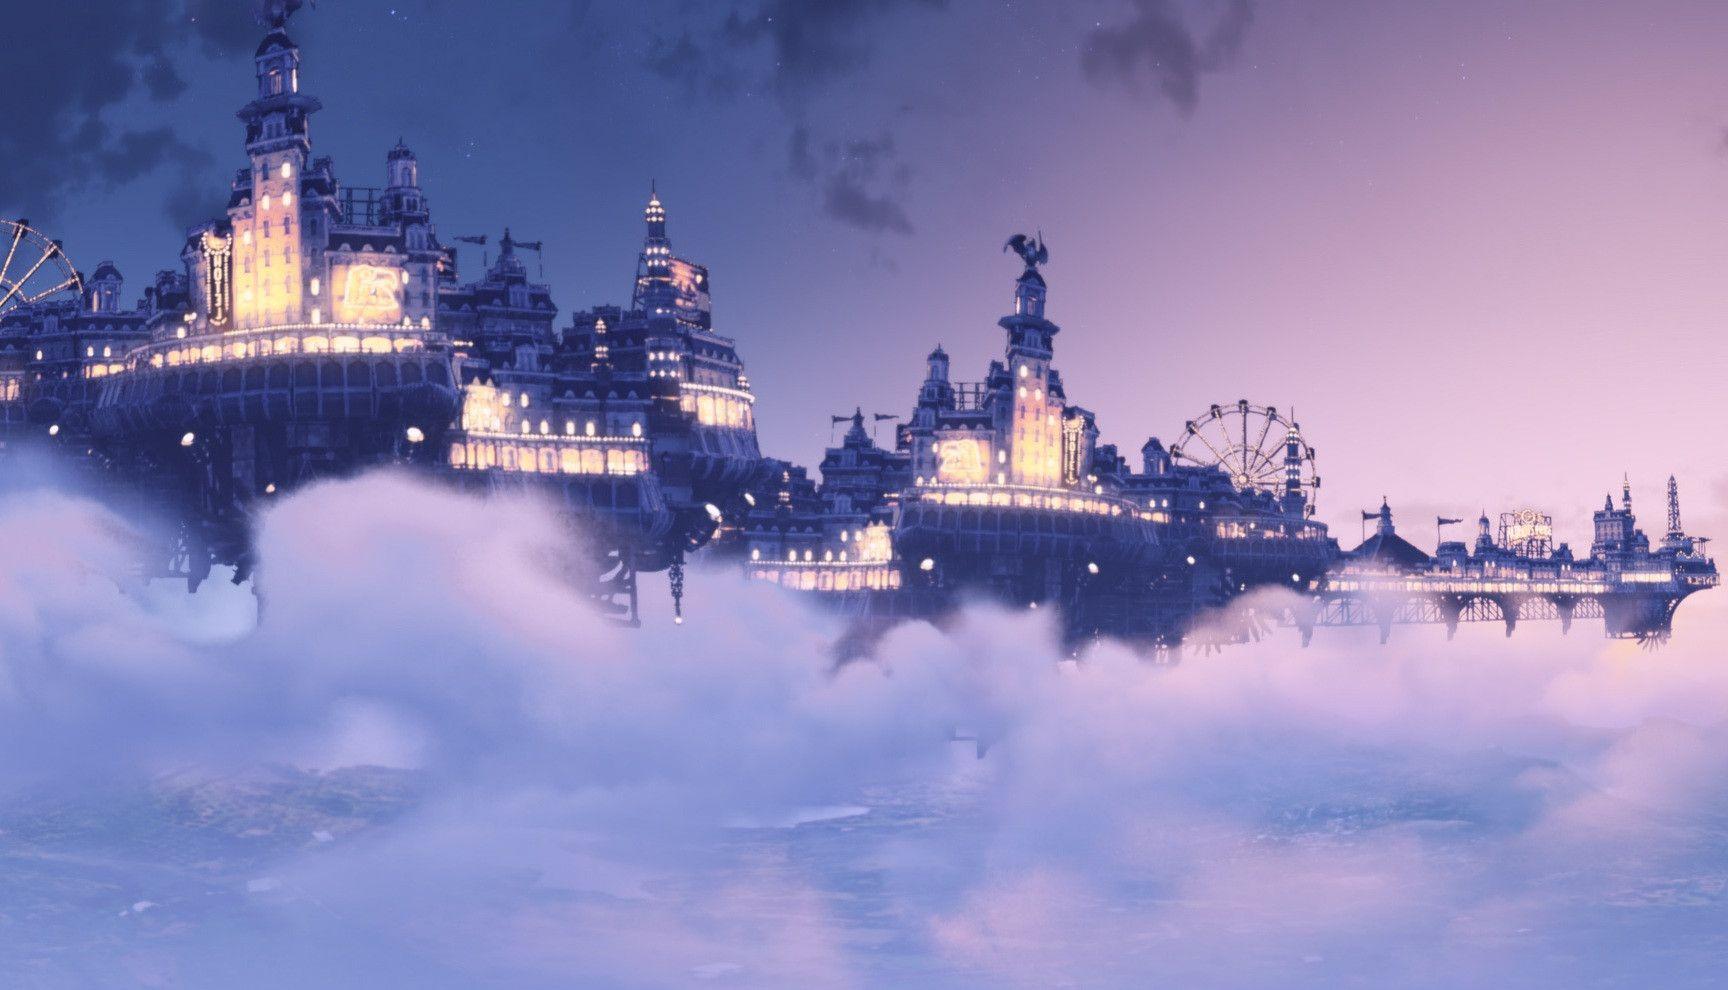 DreamScene Live Wallpaper Bioshock Infinite Lighthouse 1728x990